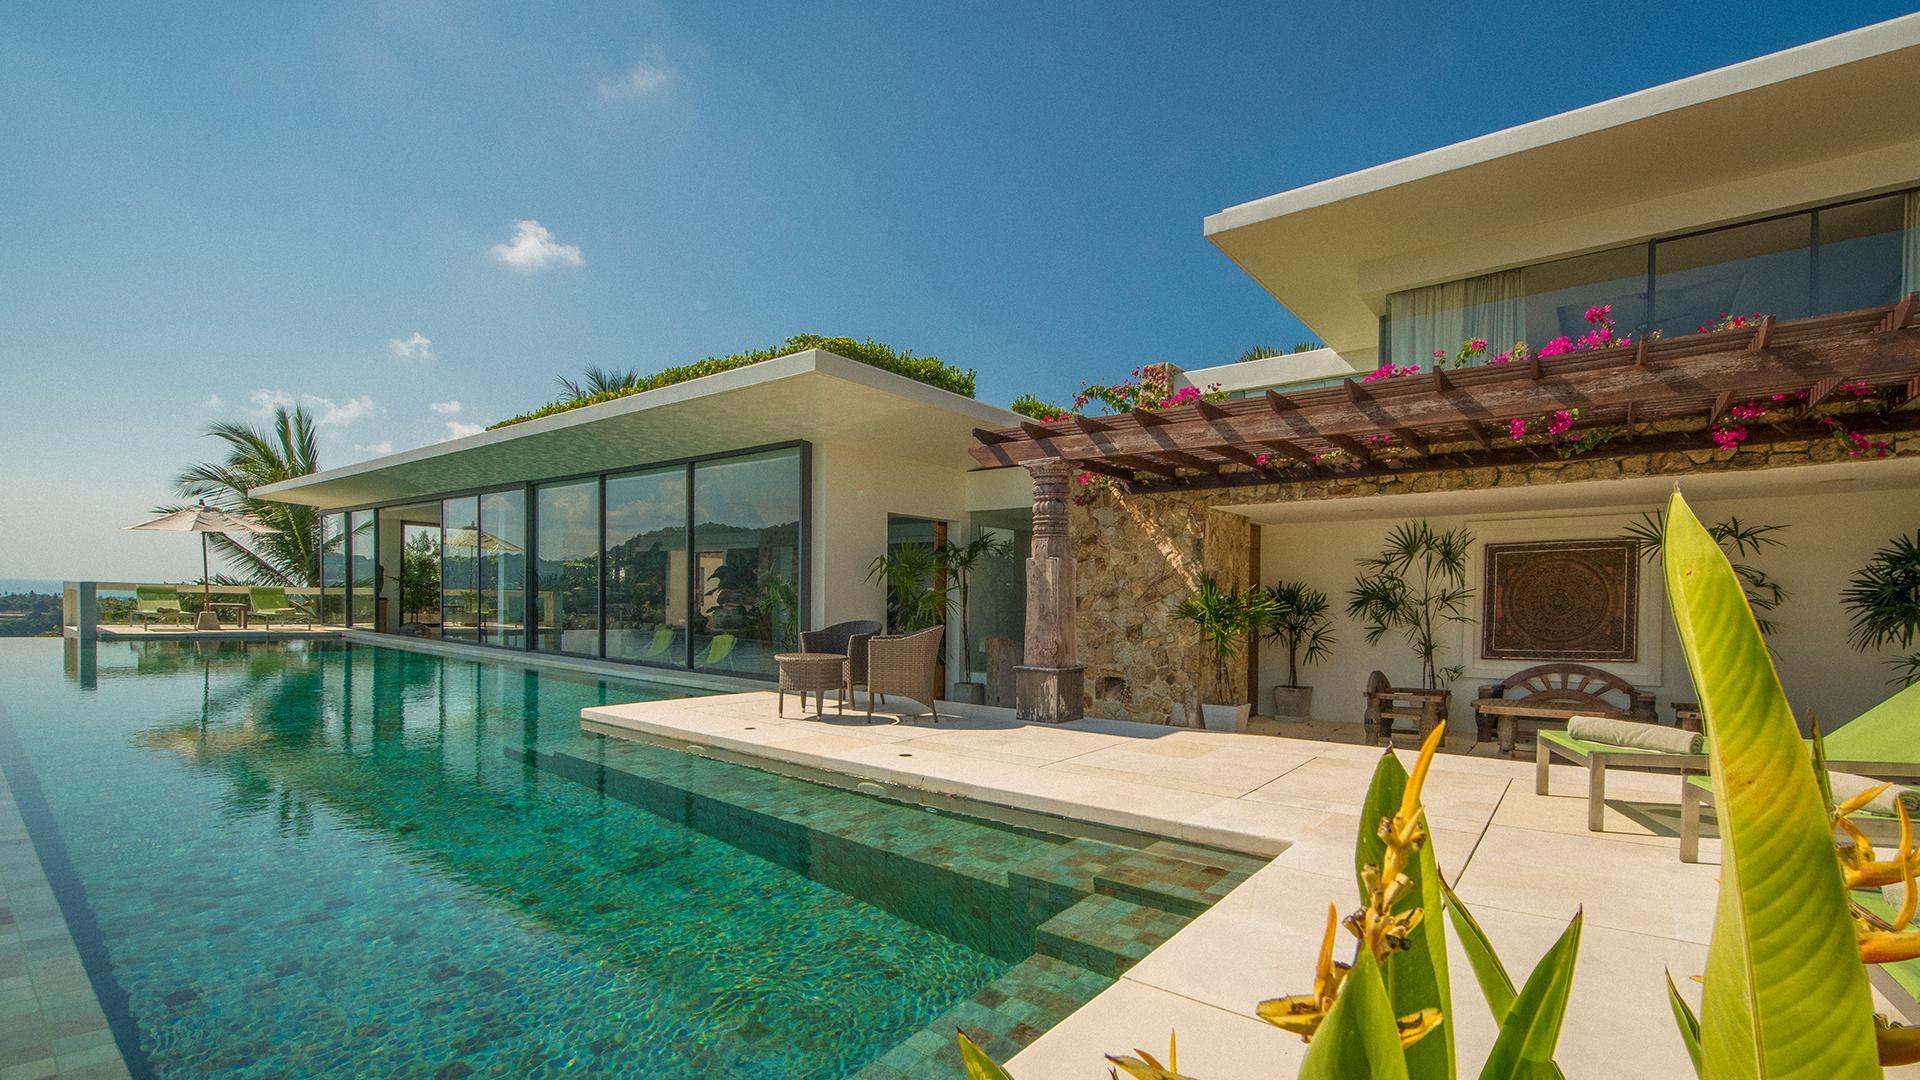 Four-Bedroom Villa image 1 at Samujana Villas by Amphoe Ko Samui, Surat Thani, Thailand